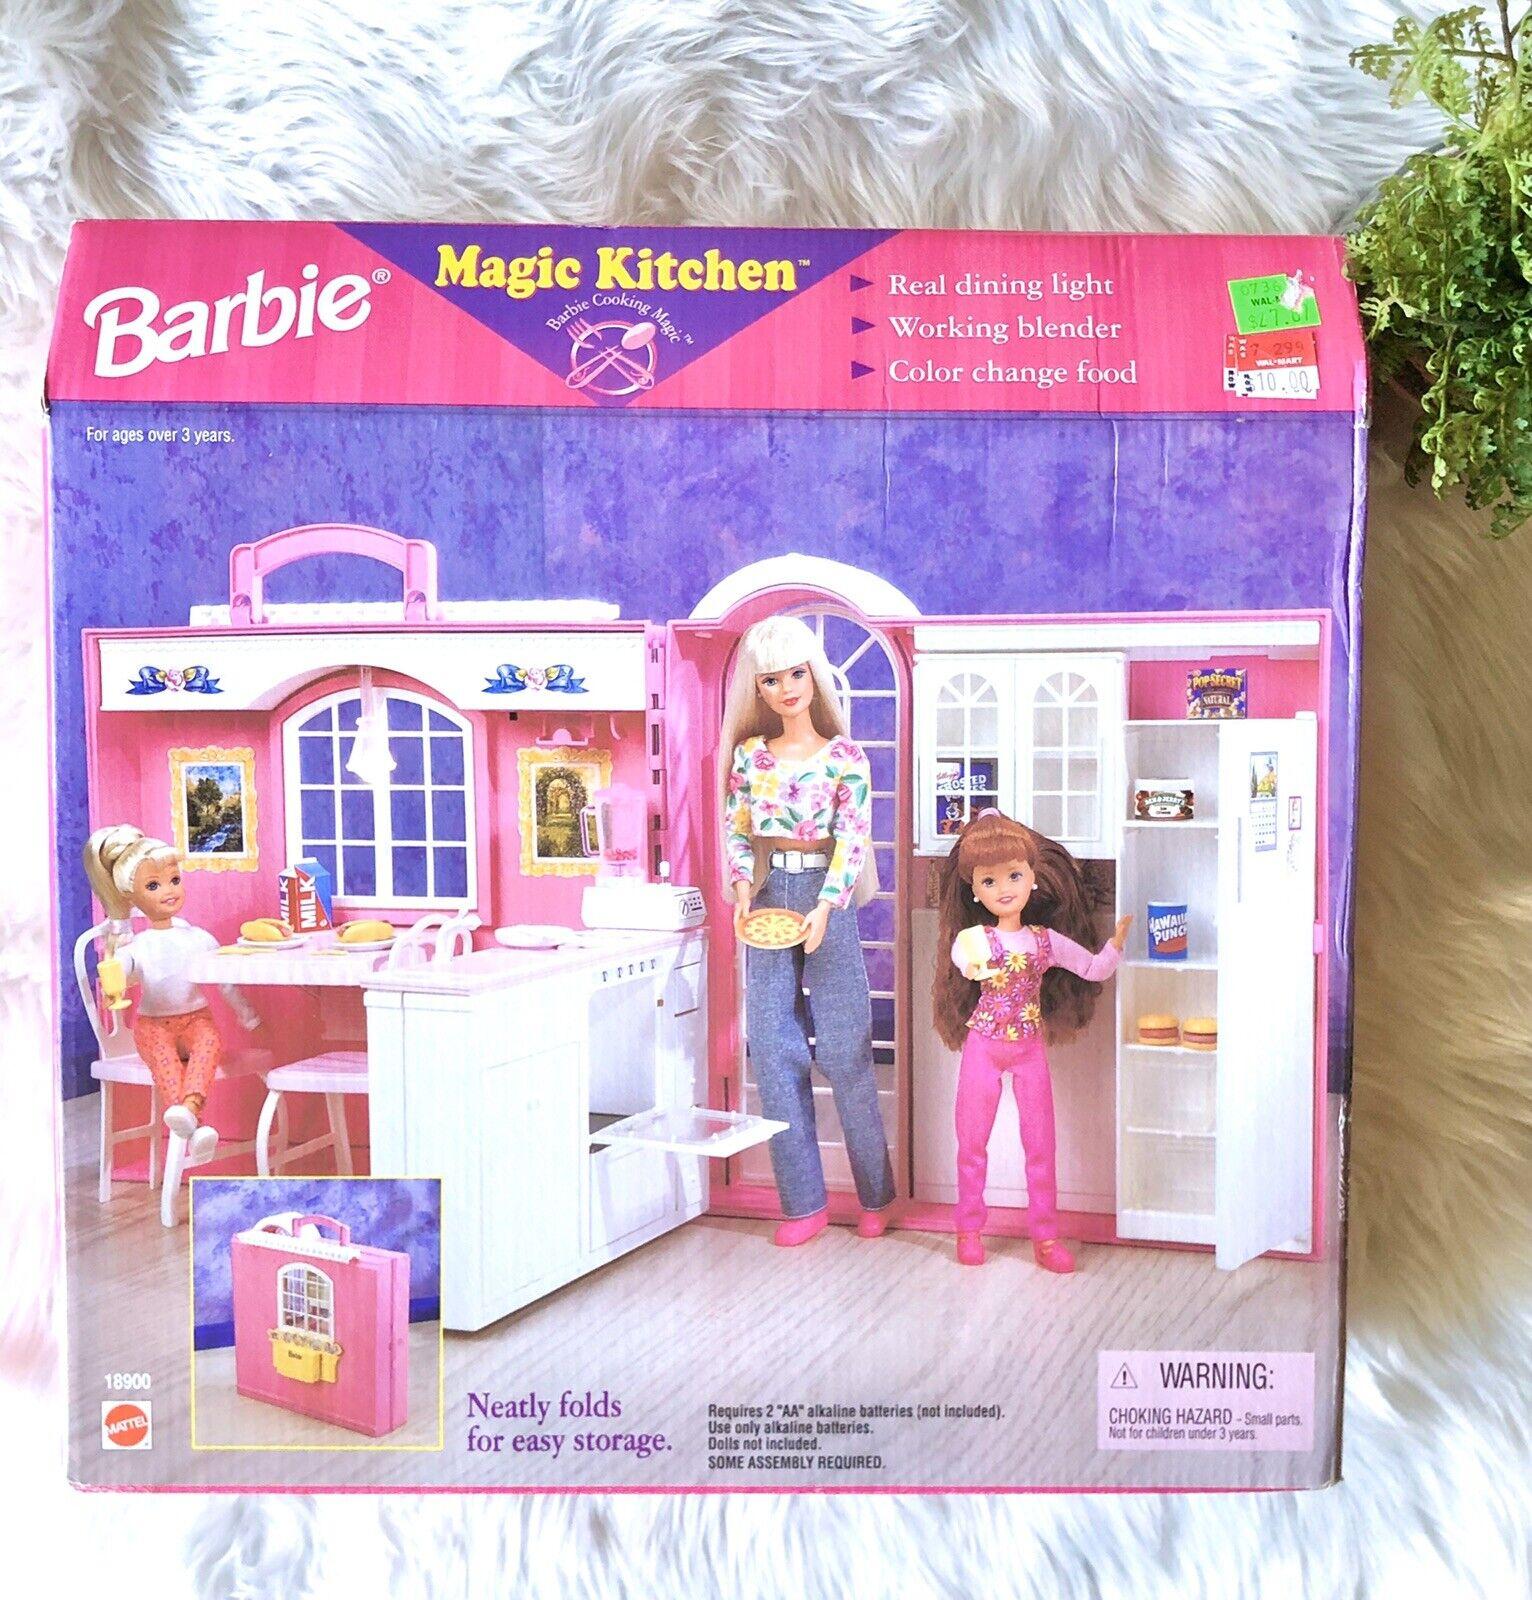 Vintage Barbie Magic Kitchen Playset by